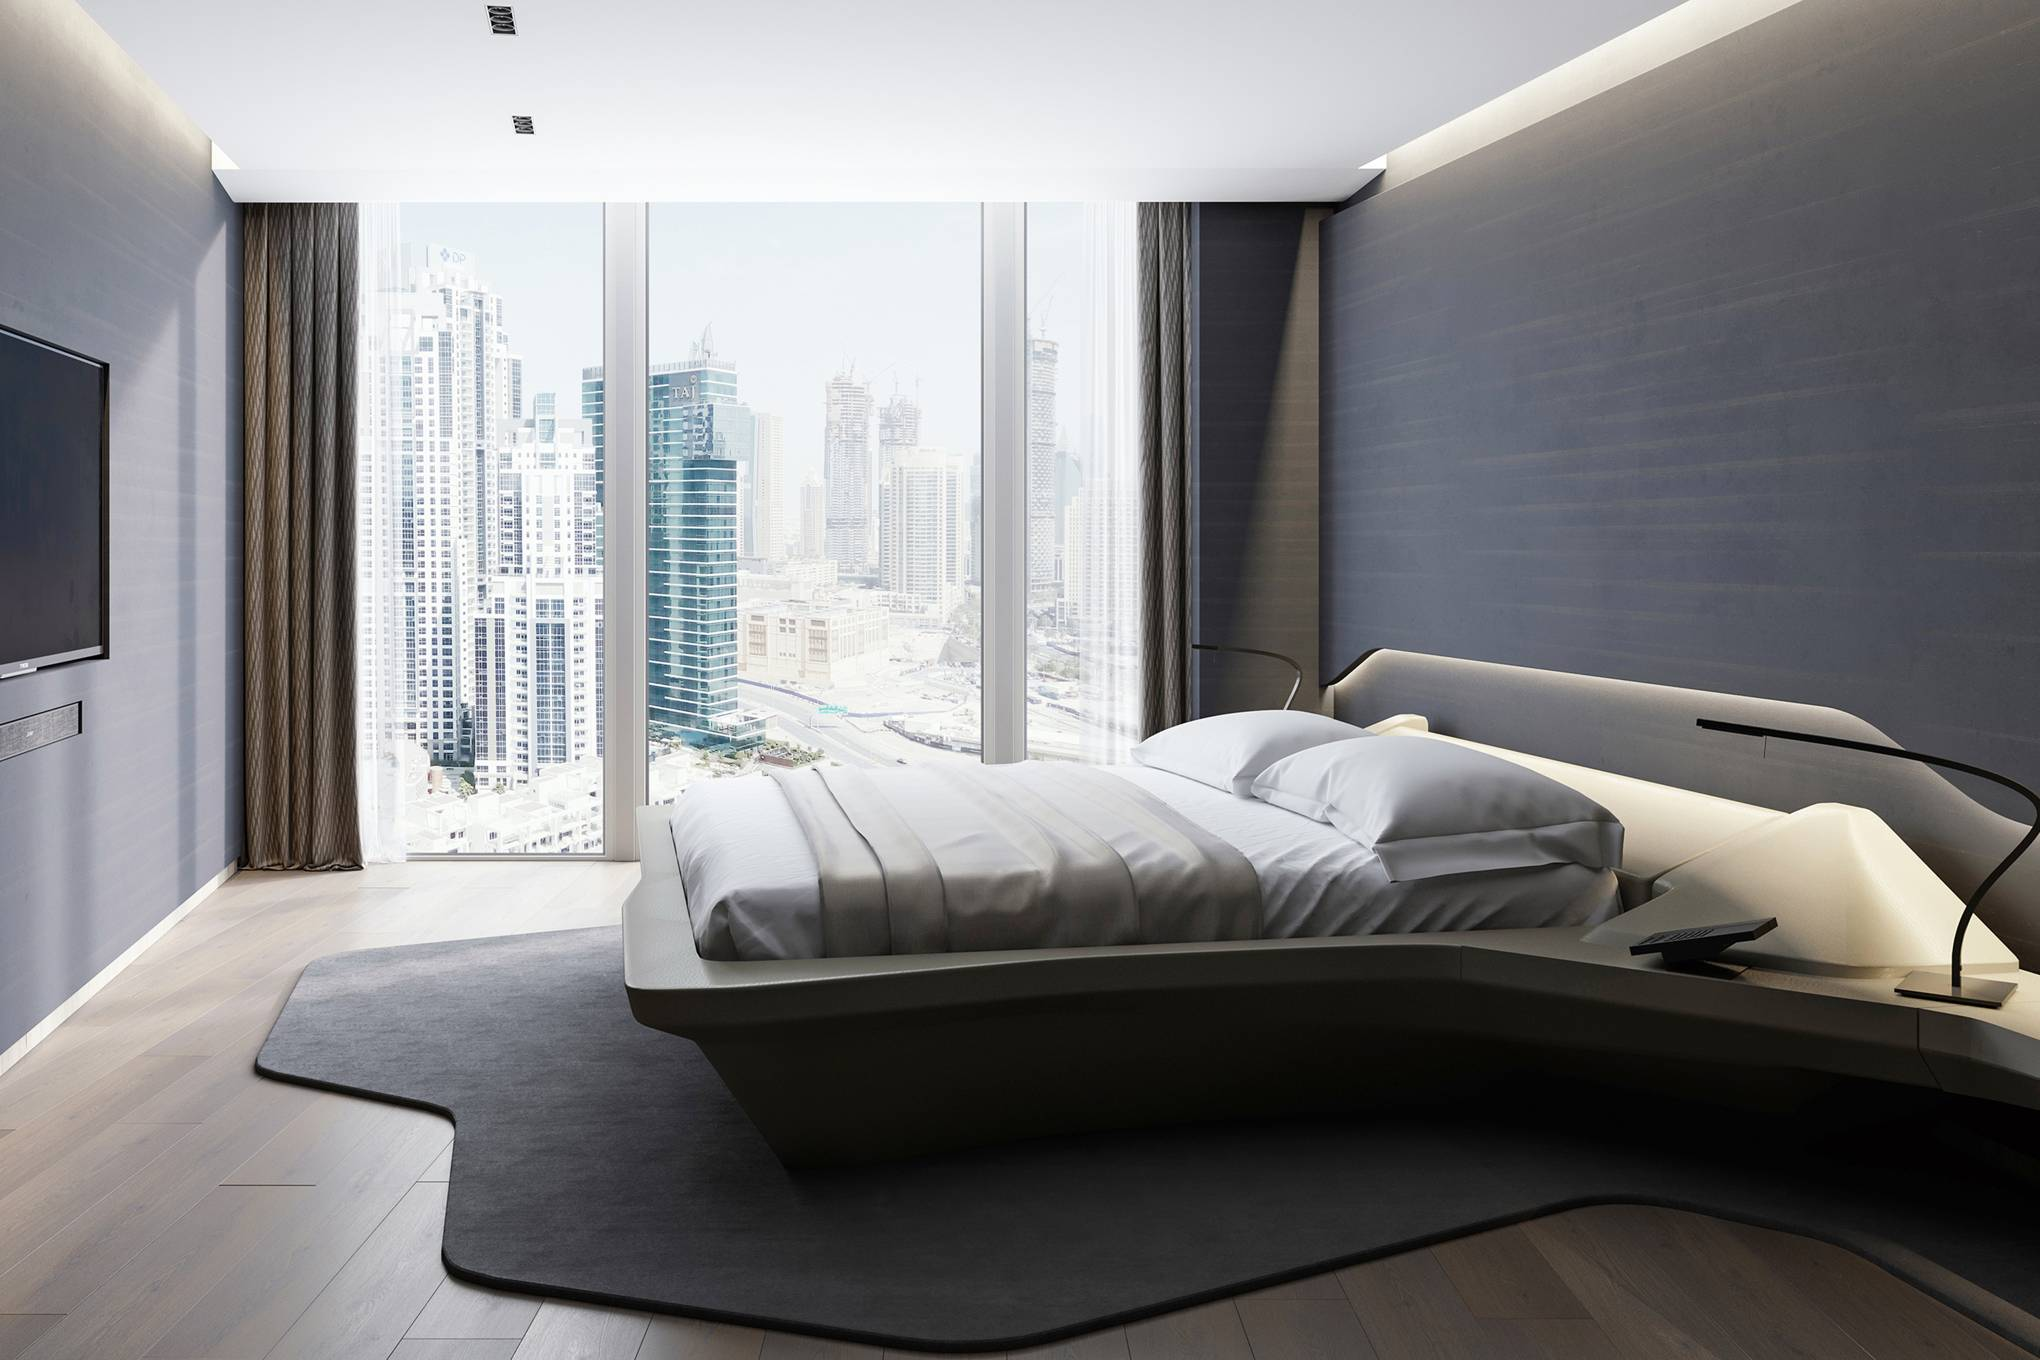 Hotel_Zaha_Hadid_VNUTRI_7